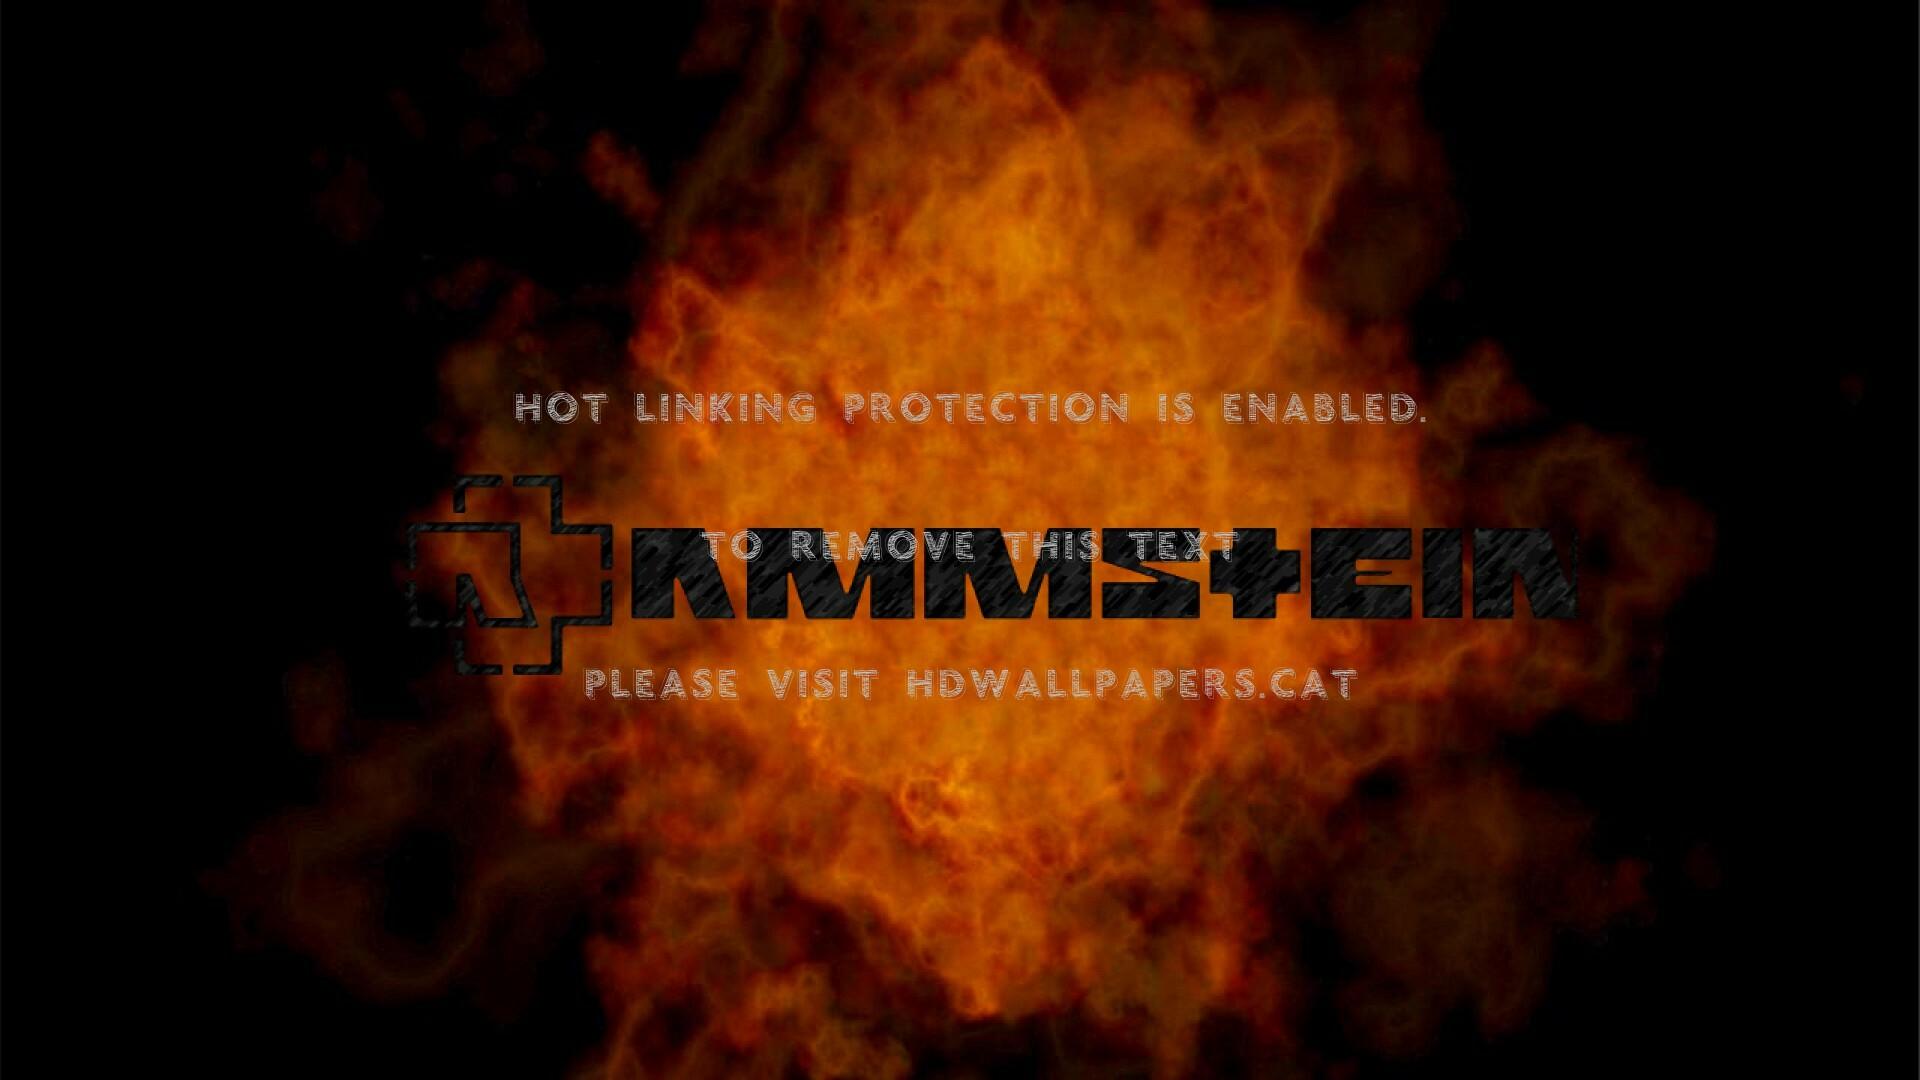 Rammstein 618786 Hd Wallpaper Backgrounds Download